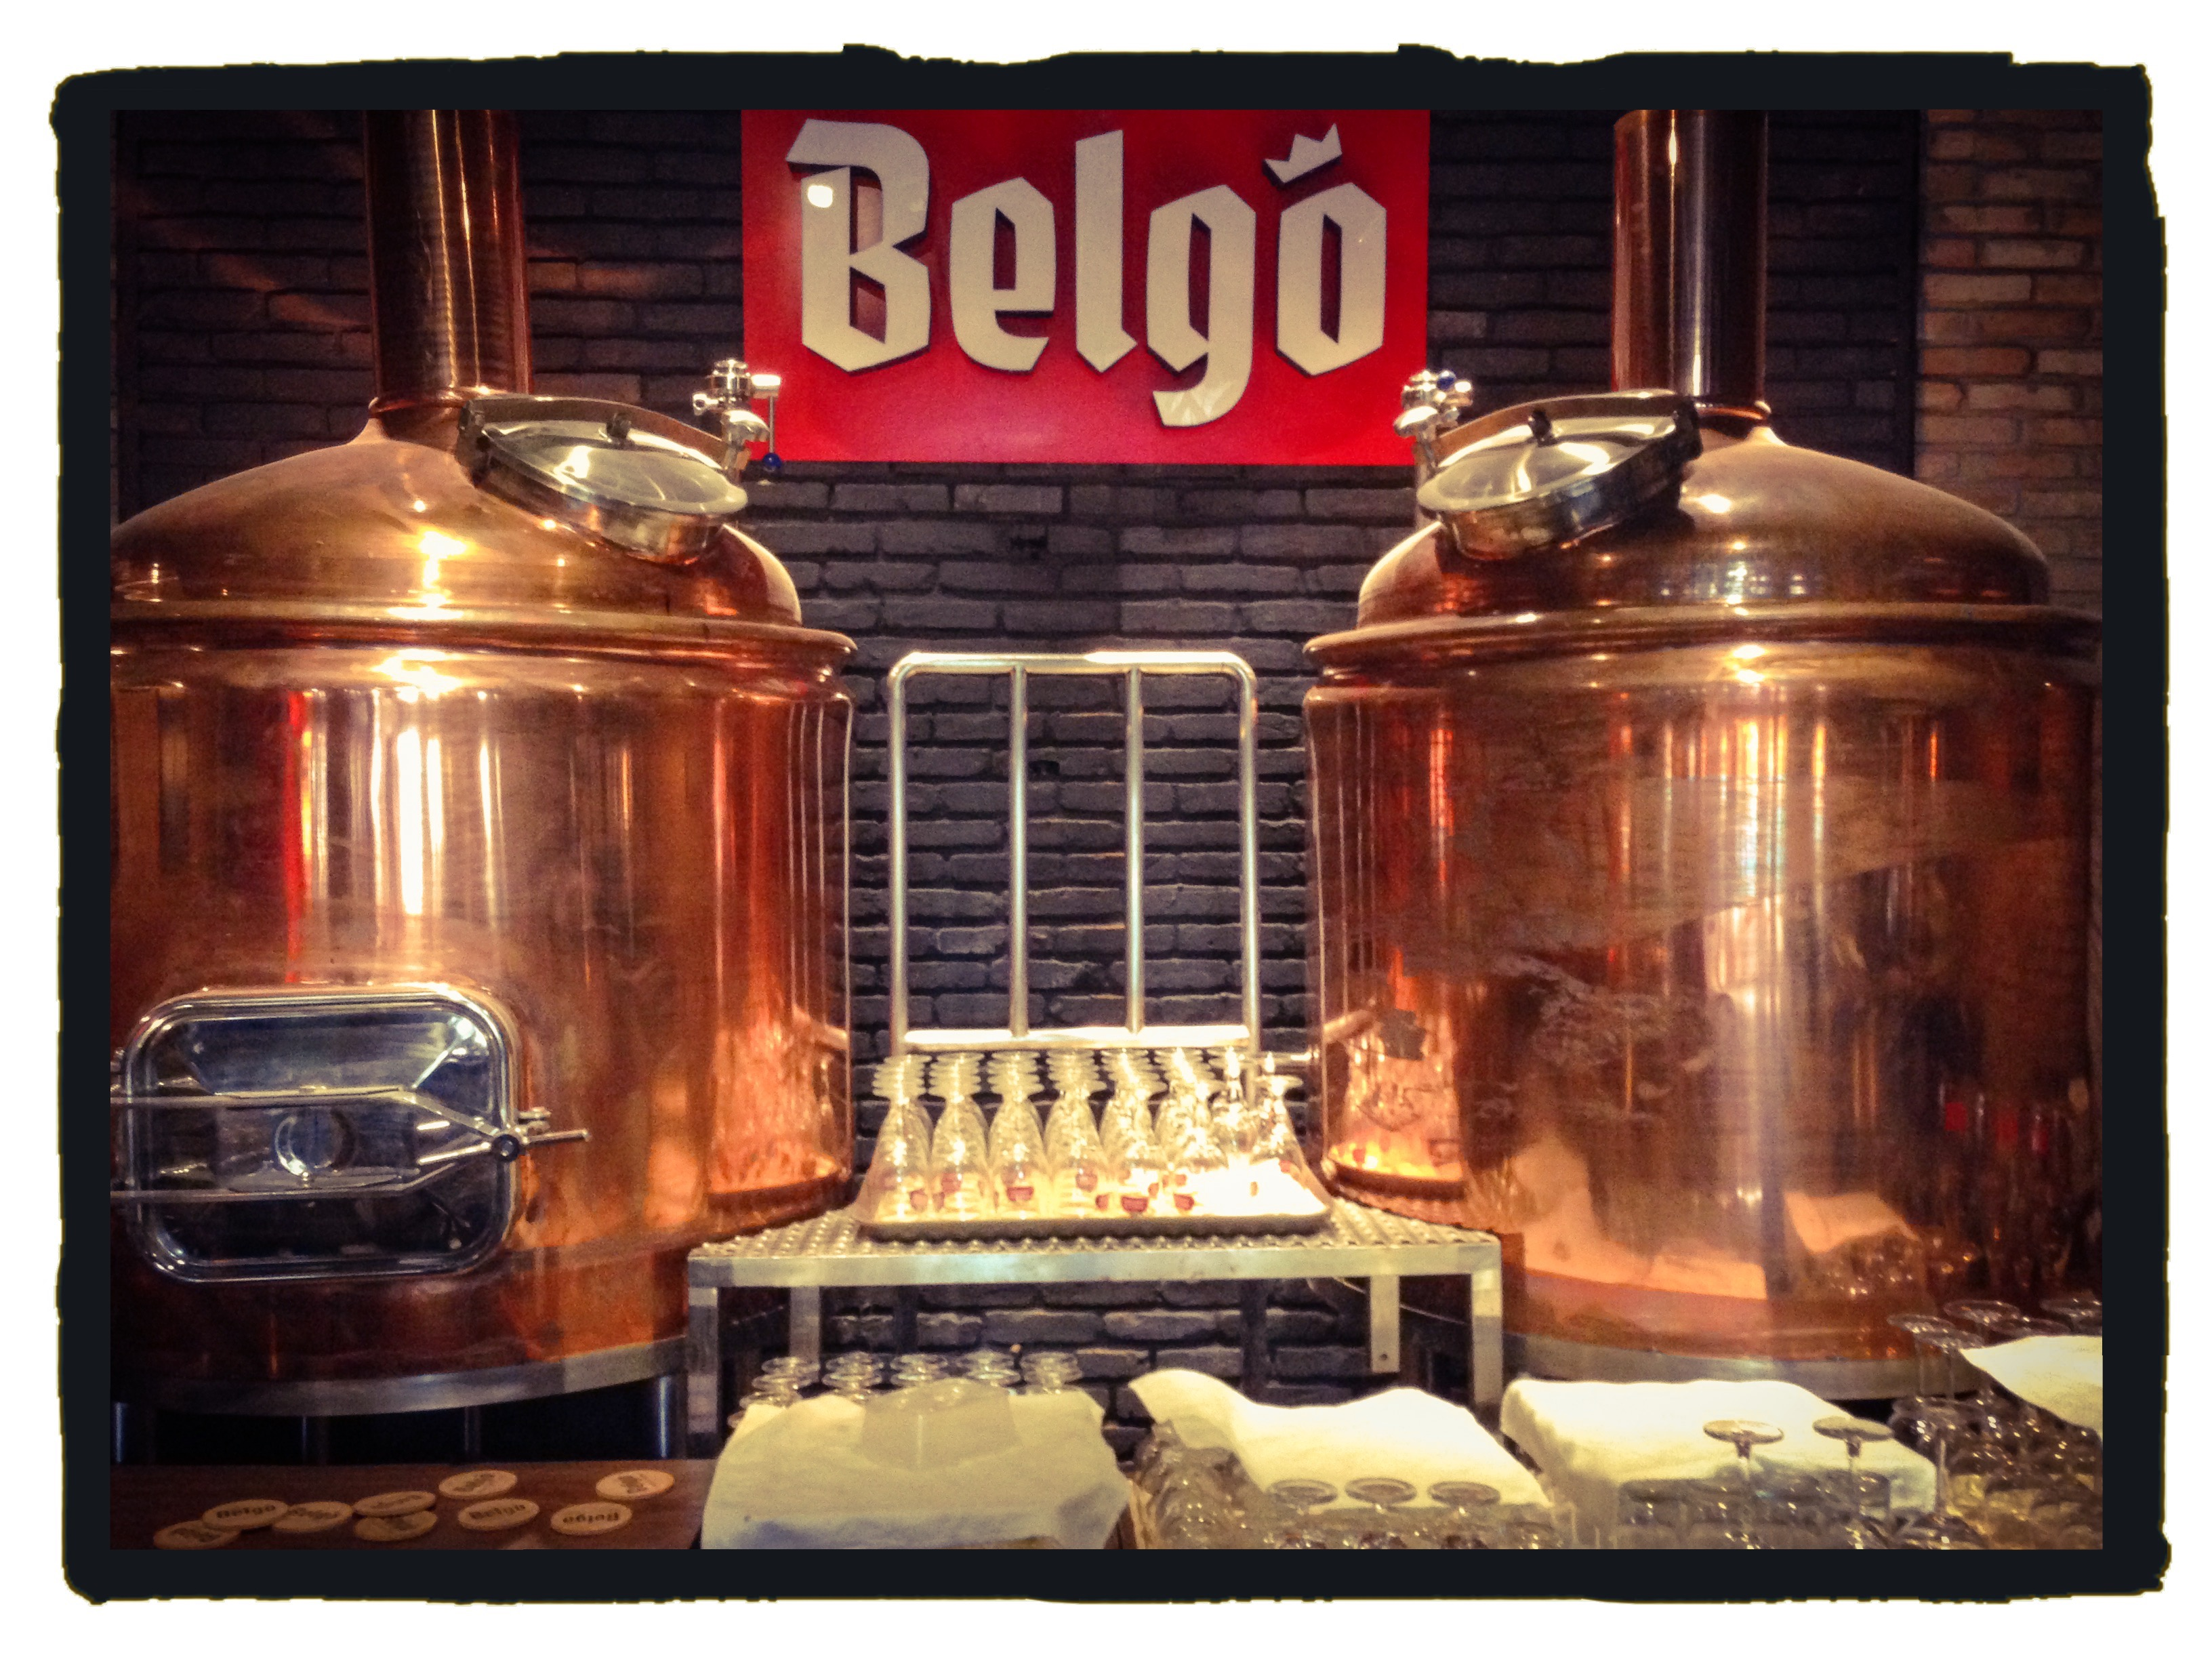 Belgo: l'esprit belge à Saigon